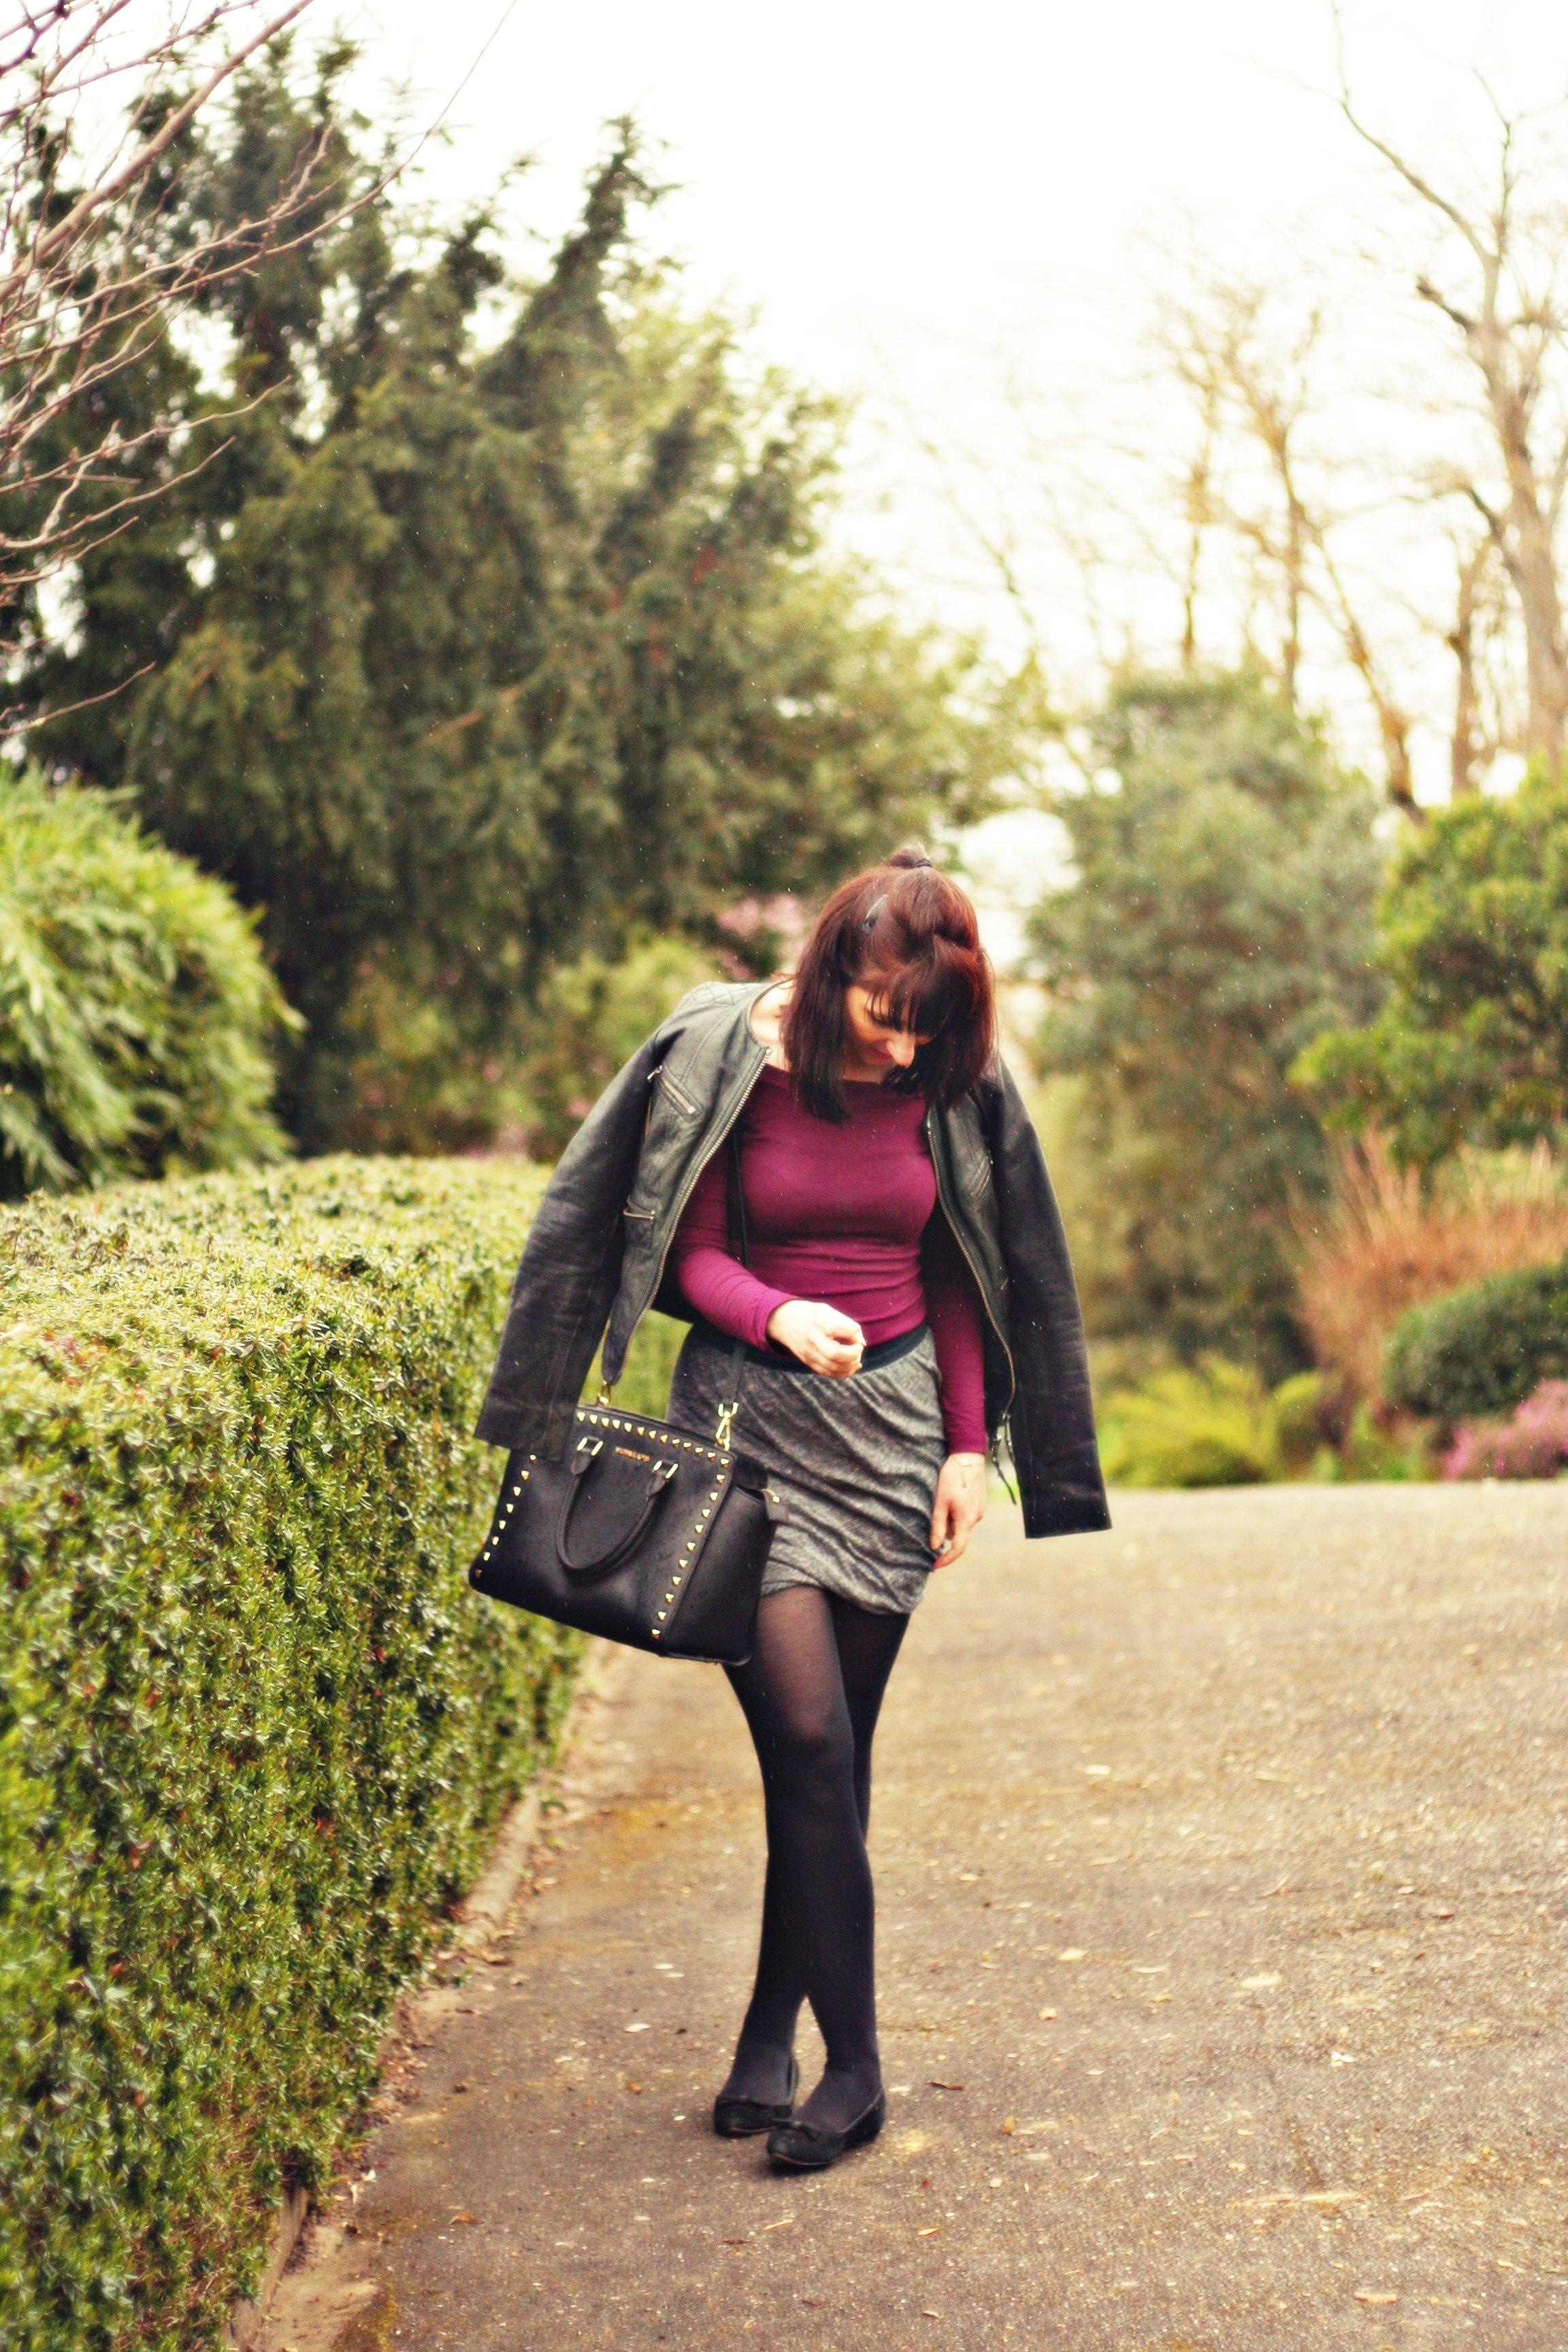 street-style-michaelkors-top-encolure-80-asos-blog-mode-femme-toulouse